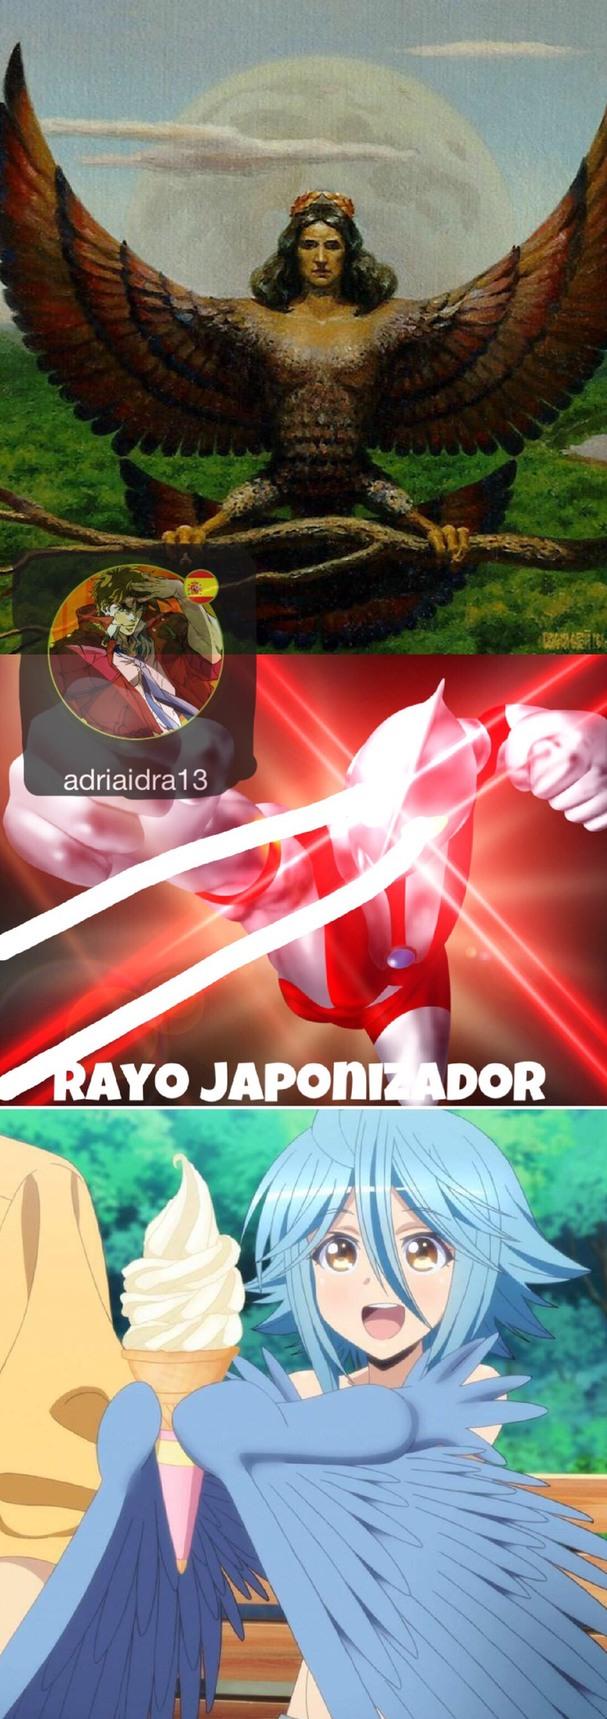 rayo japonizador - meme